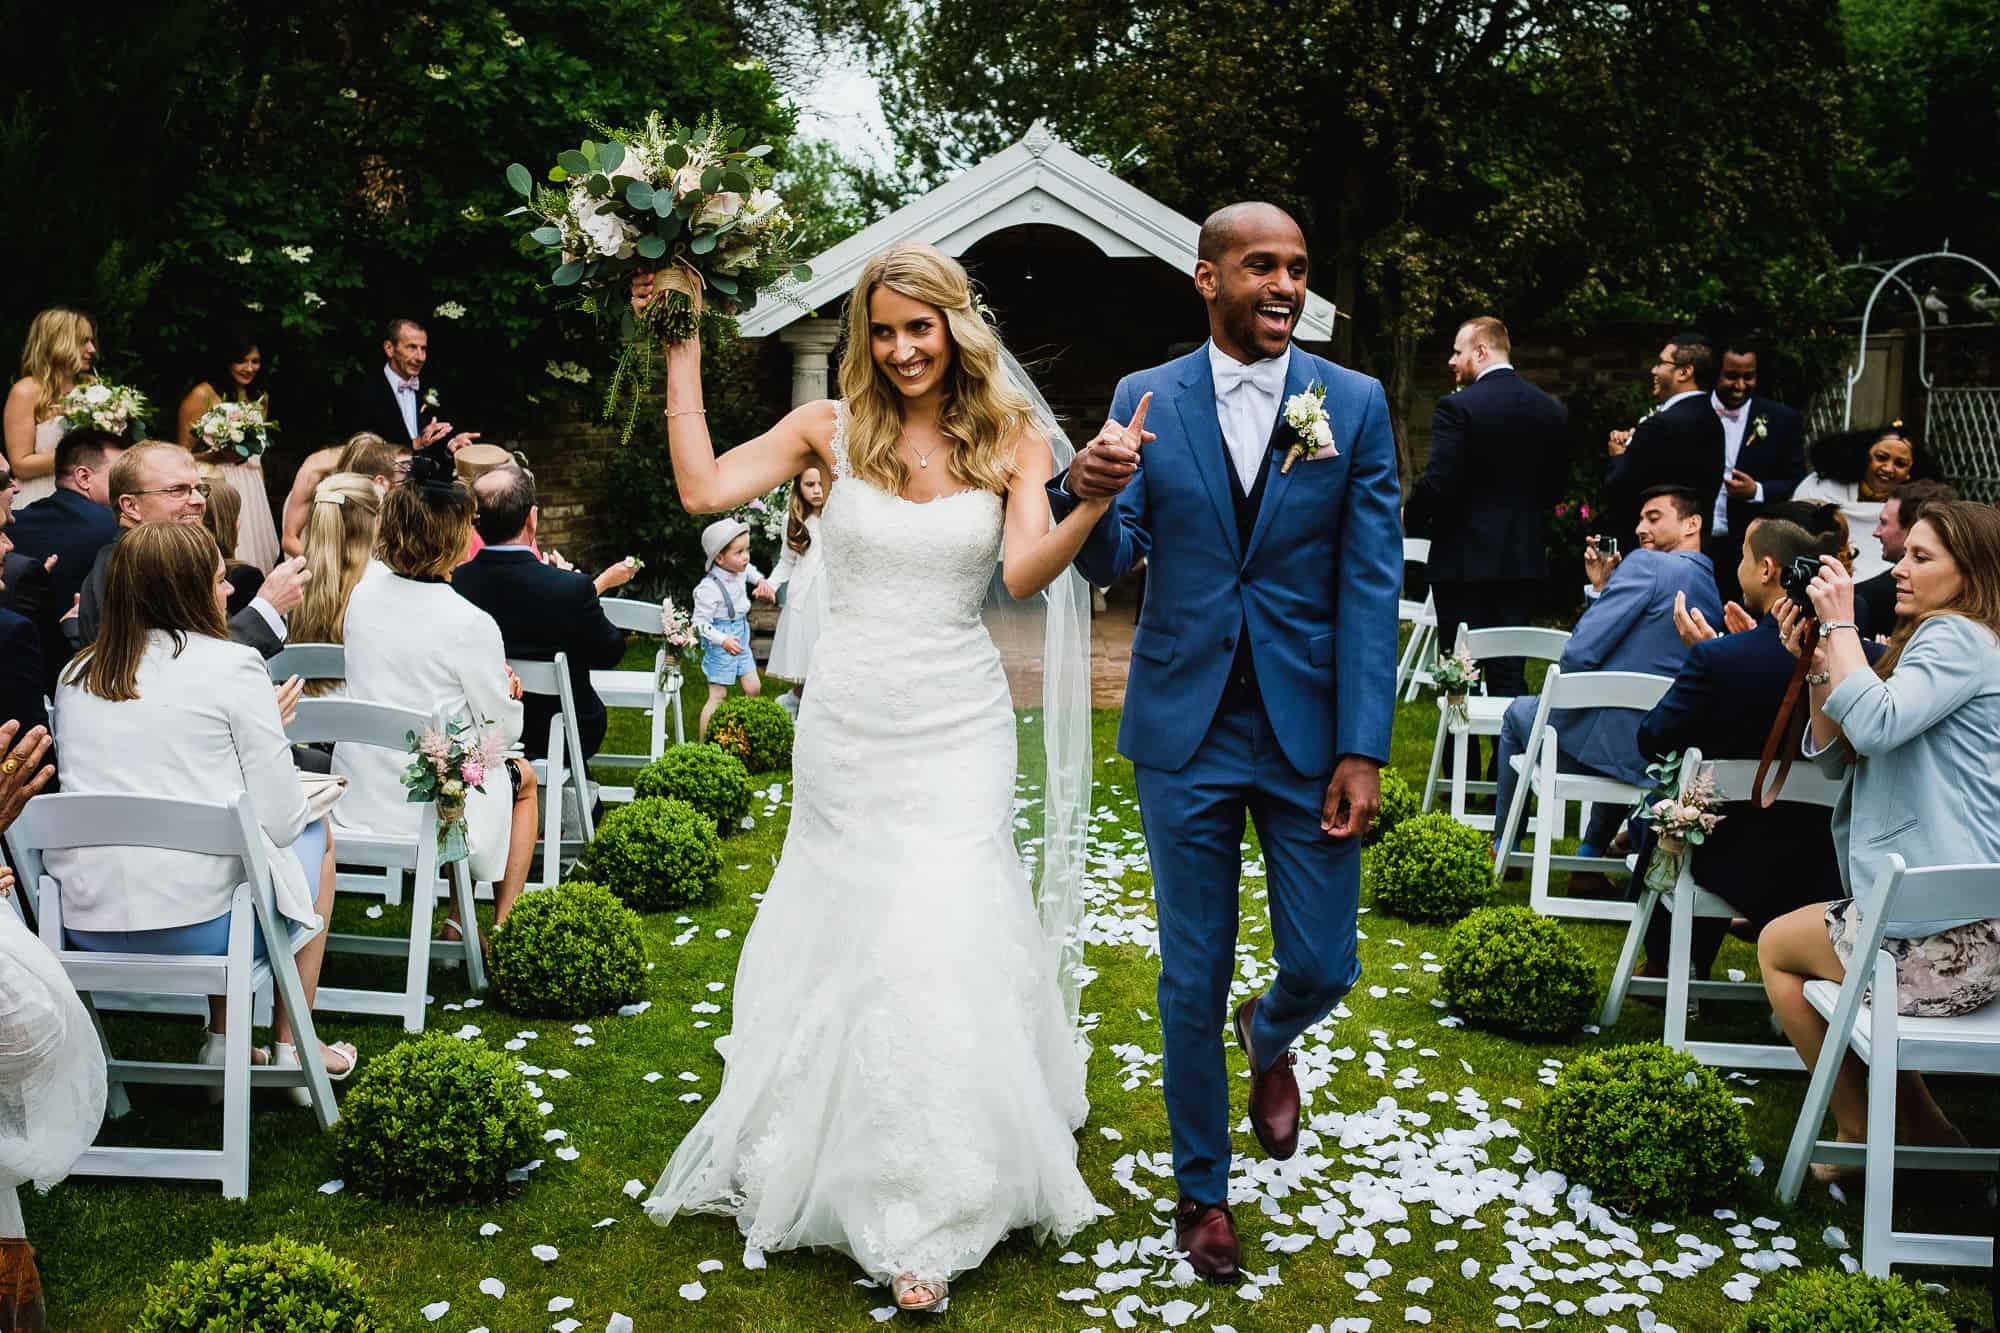 marleybrook-house-wedding-photography-matt-tyler-0032